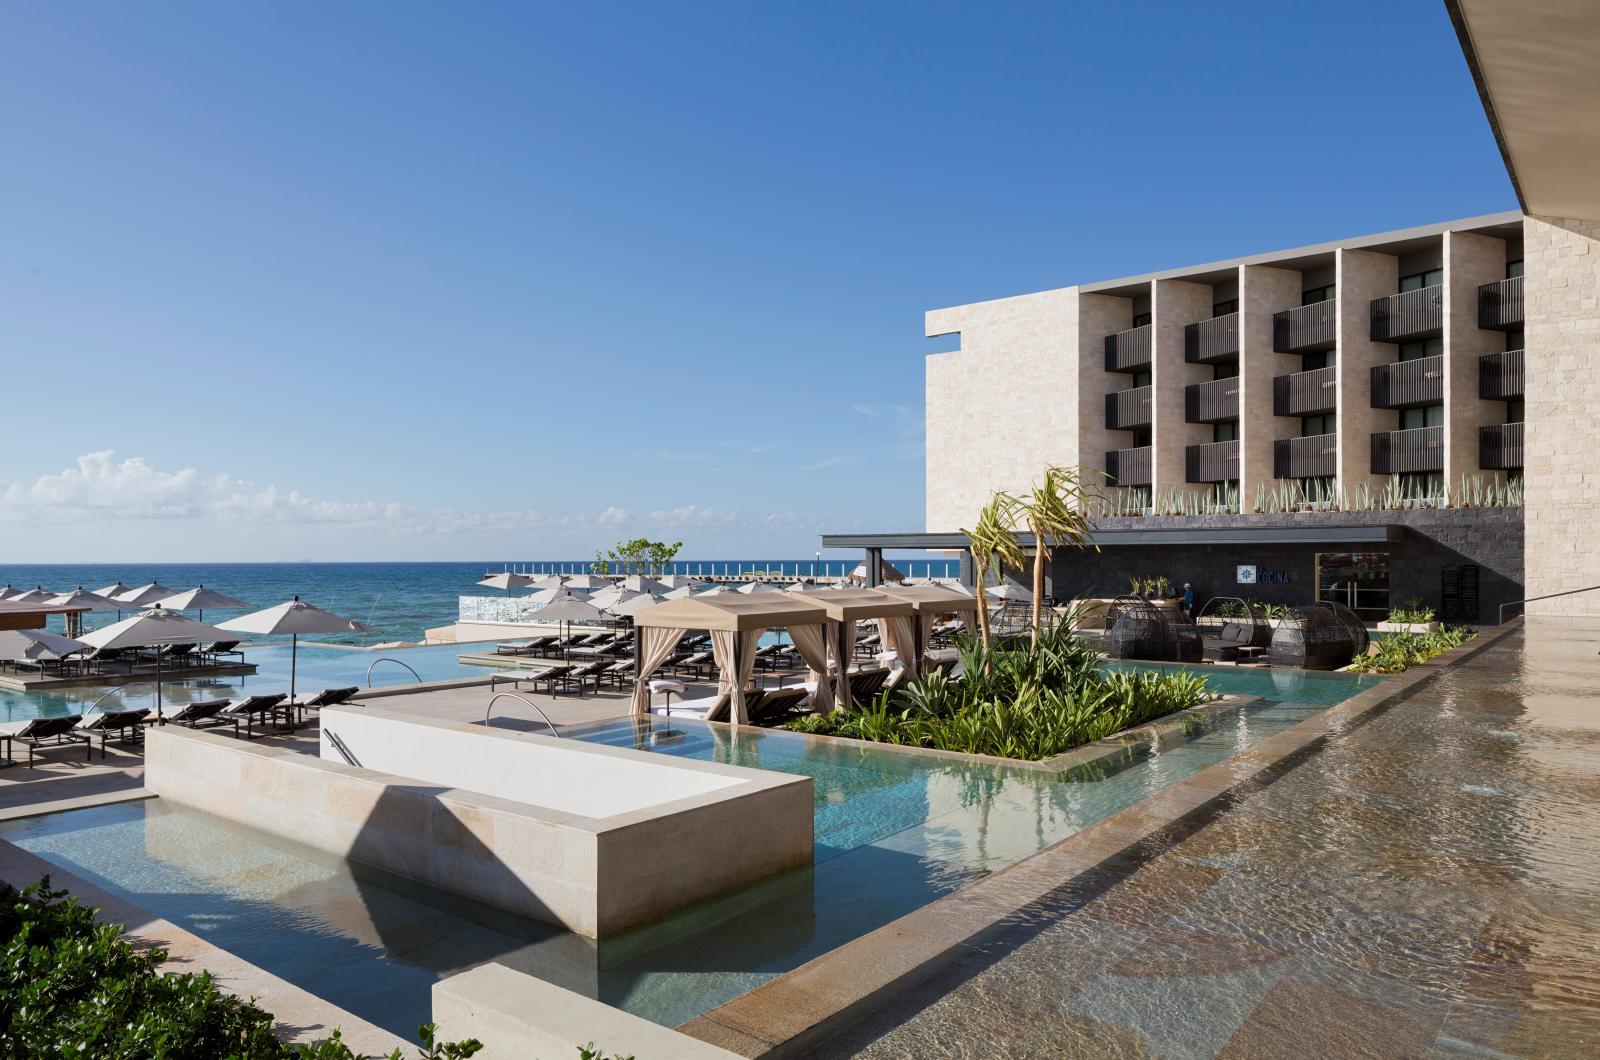 Grand-Hyatt-Playa-del-Carmen-Hotel-by-Sordo-Madaleno-Arquitectos-01.jpg